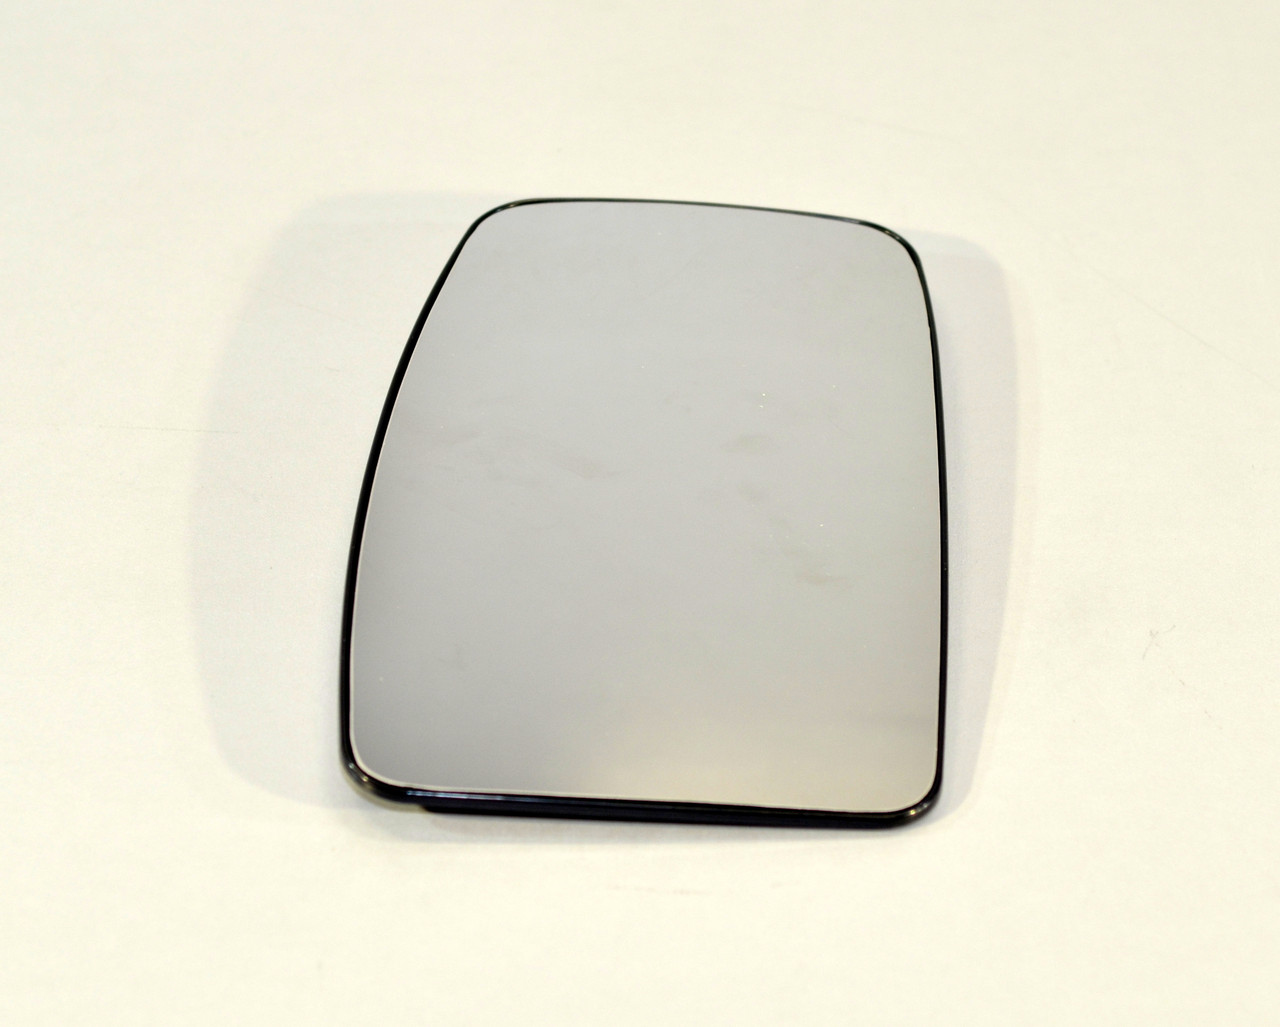 Стекло зеркала заднего вида (L, левое) на Renault Master III 2010->  — Polcar (Тайвань)  -  60N1543M